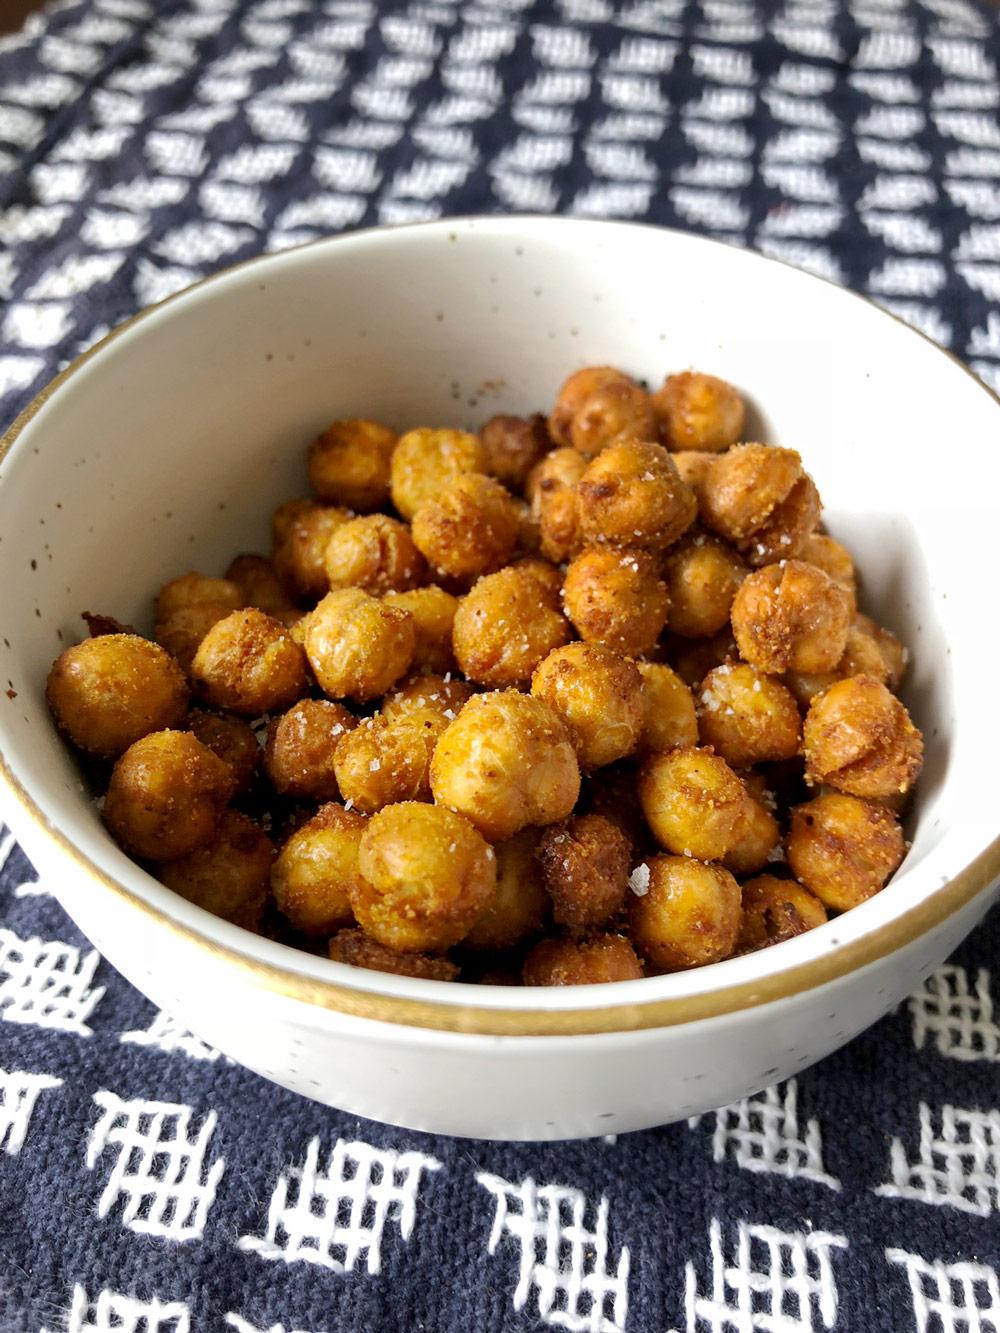 crunchy-chickpeas-in-bowl